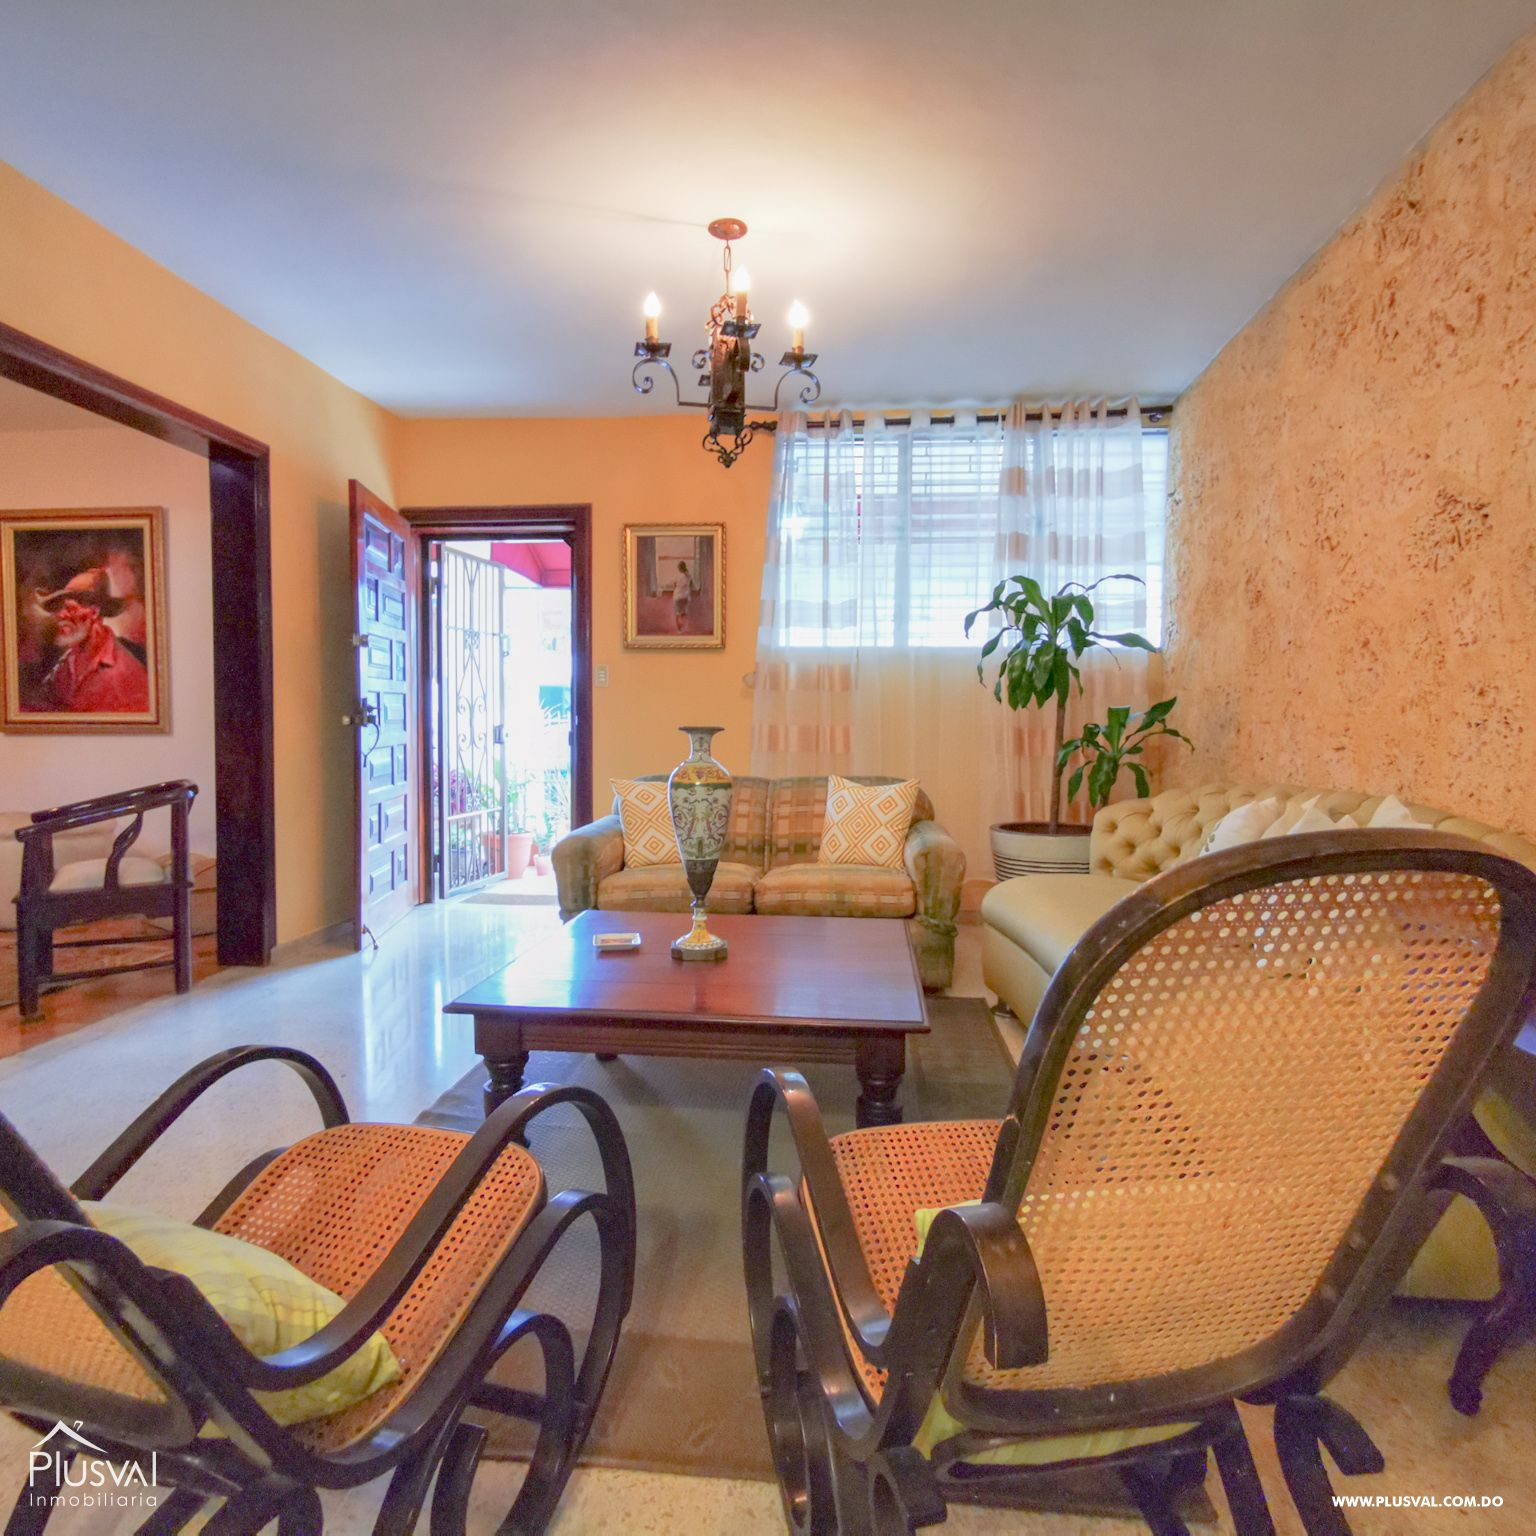 Casa-Terreno 500 mts2 Ideal para Plaza o Local Comercial en Los Prados 179165